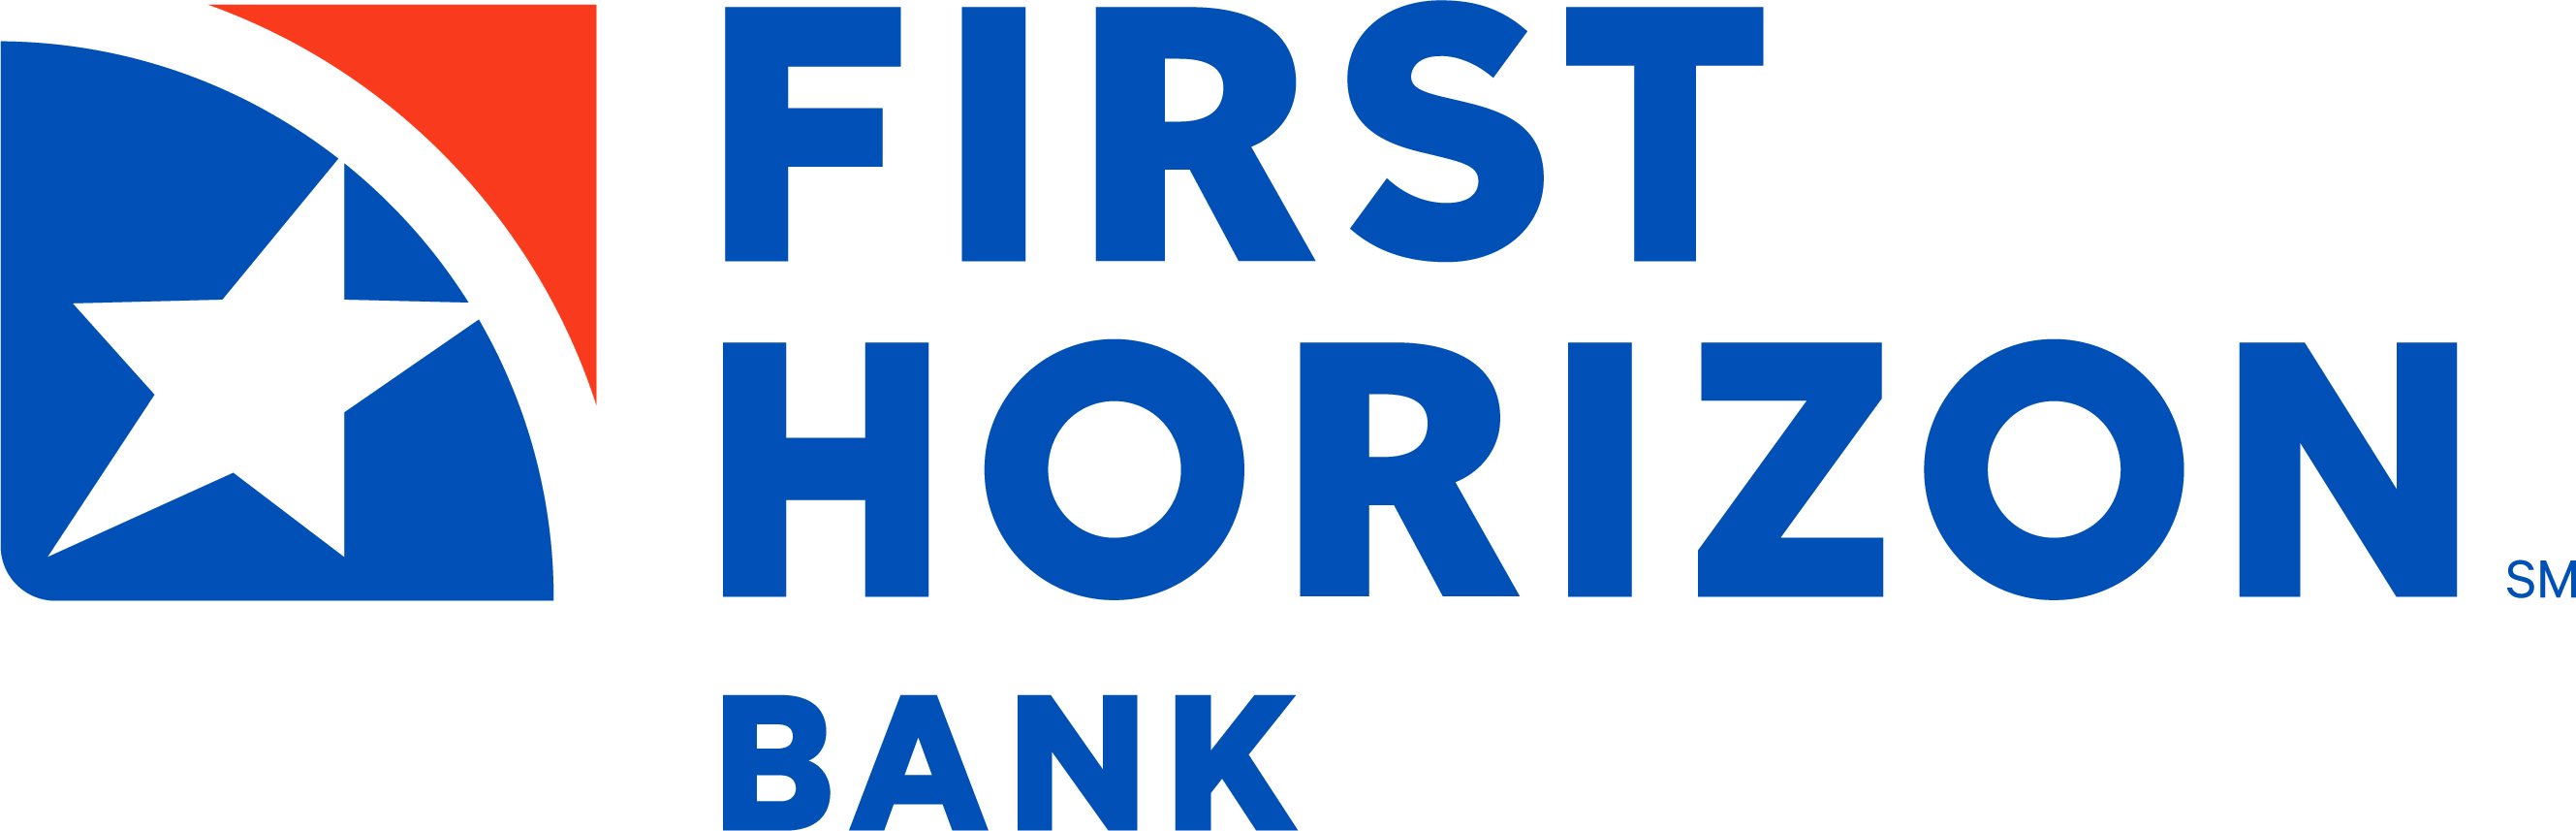 First Horizon Bank, Restaurant Finance